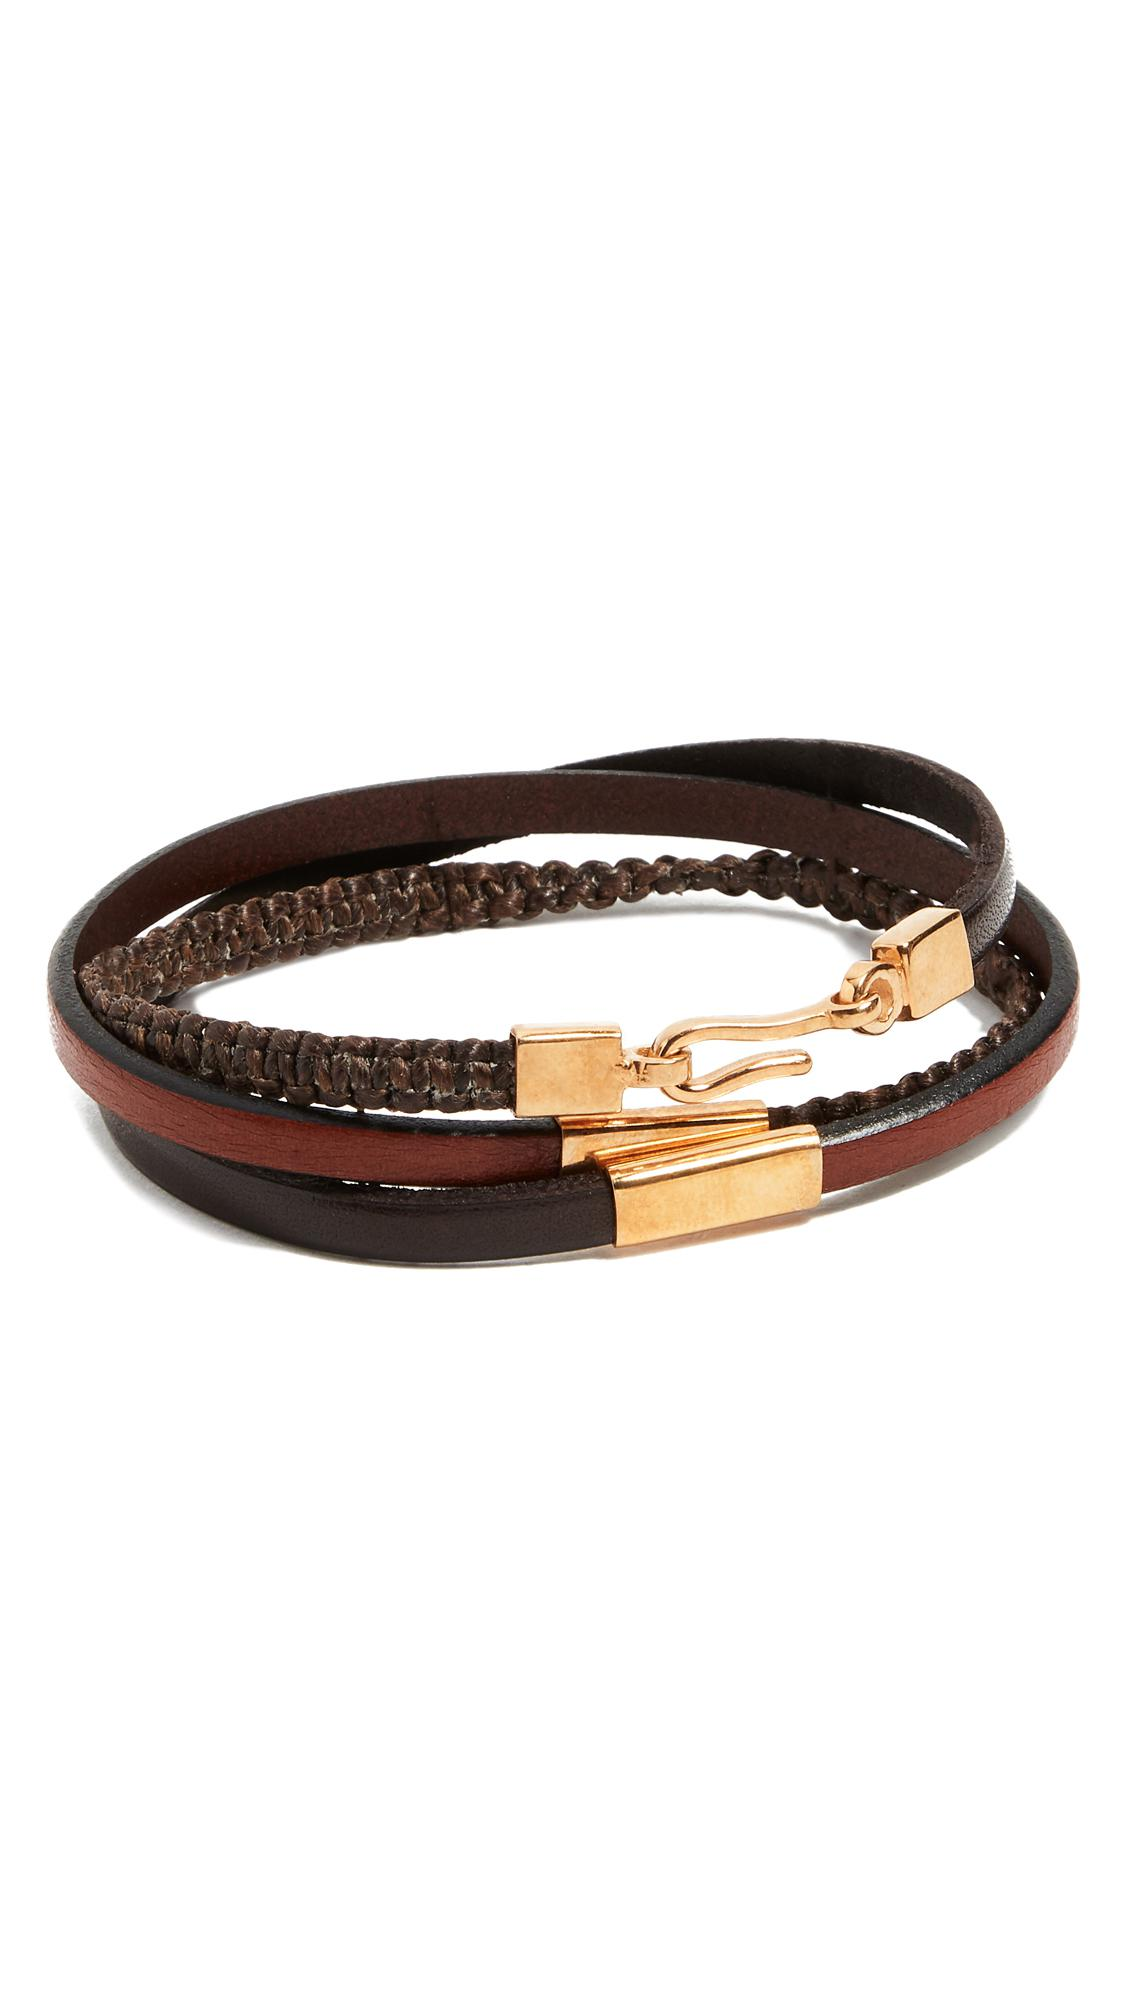 Caputo & Co. Hand Knotted Triple Wrap Bracelet - Dark Brown qKKCiu1mM